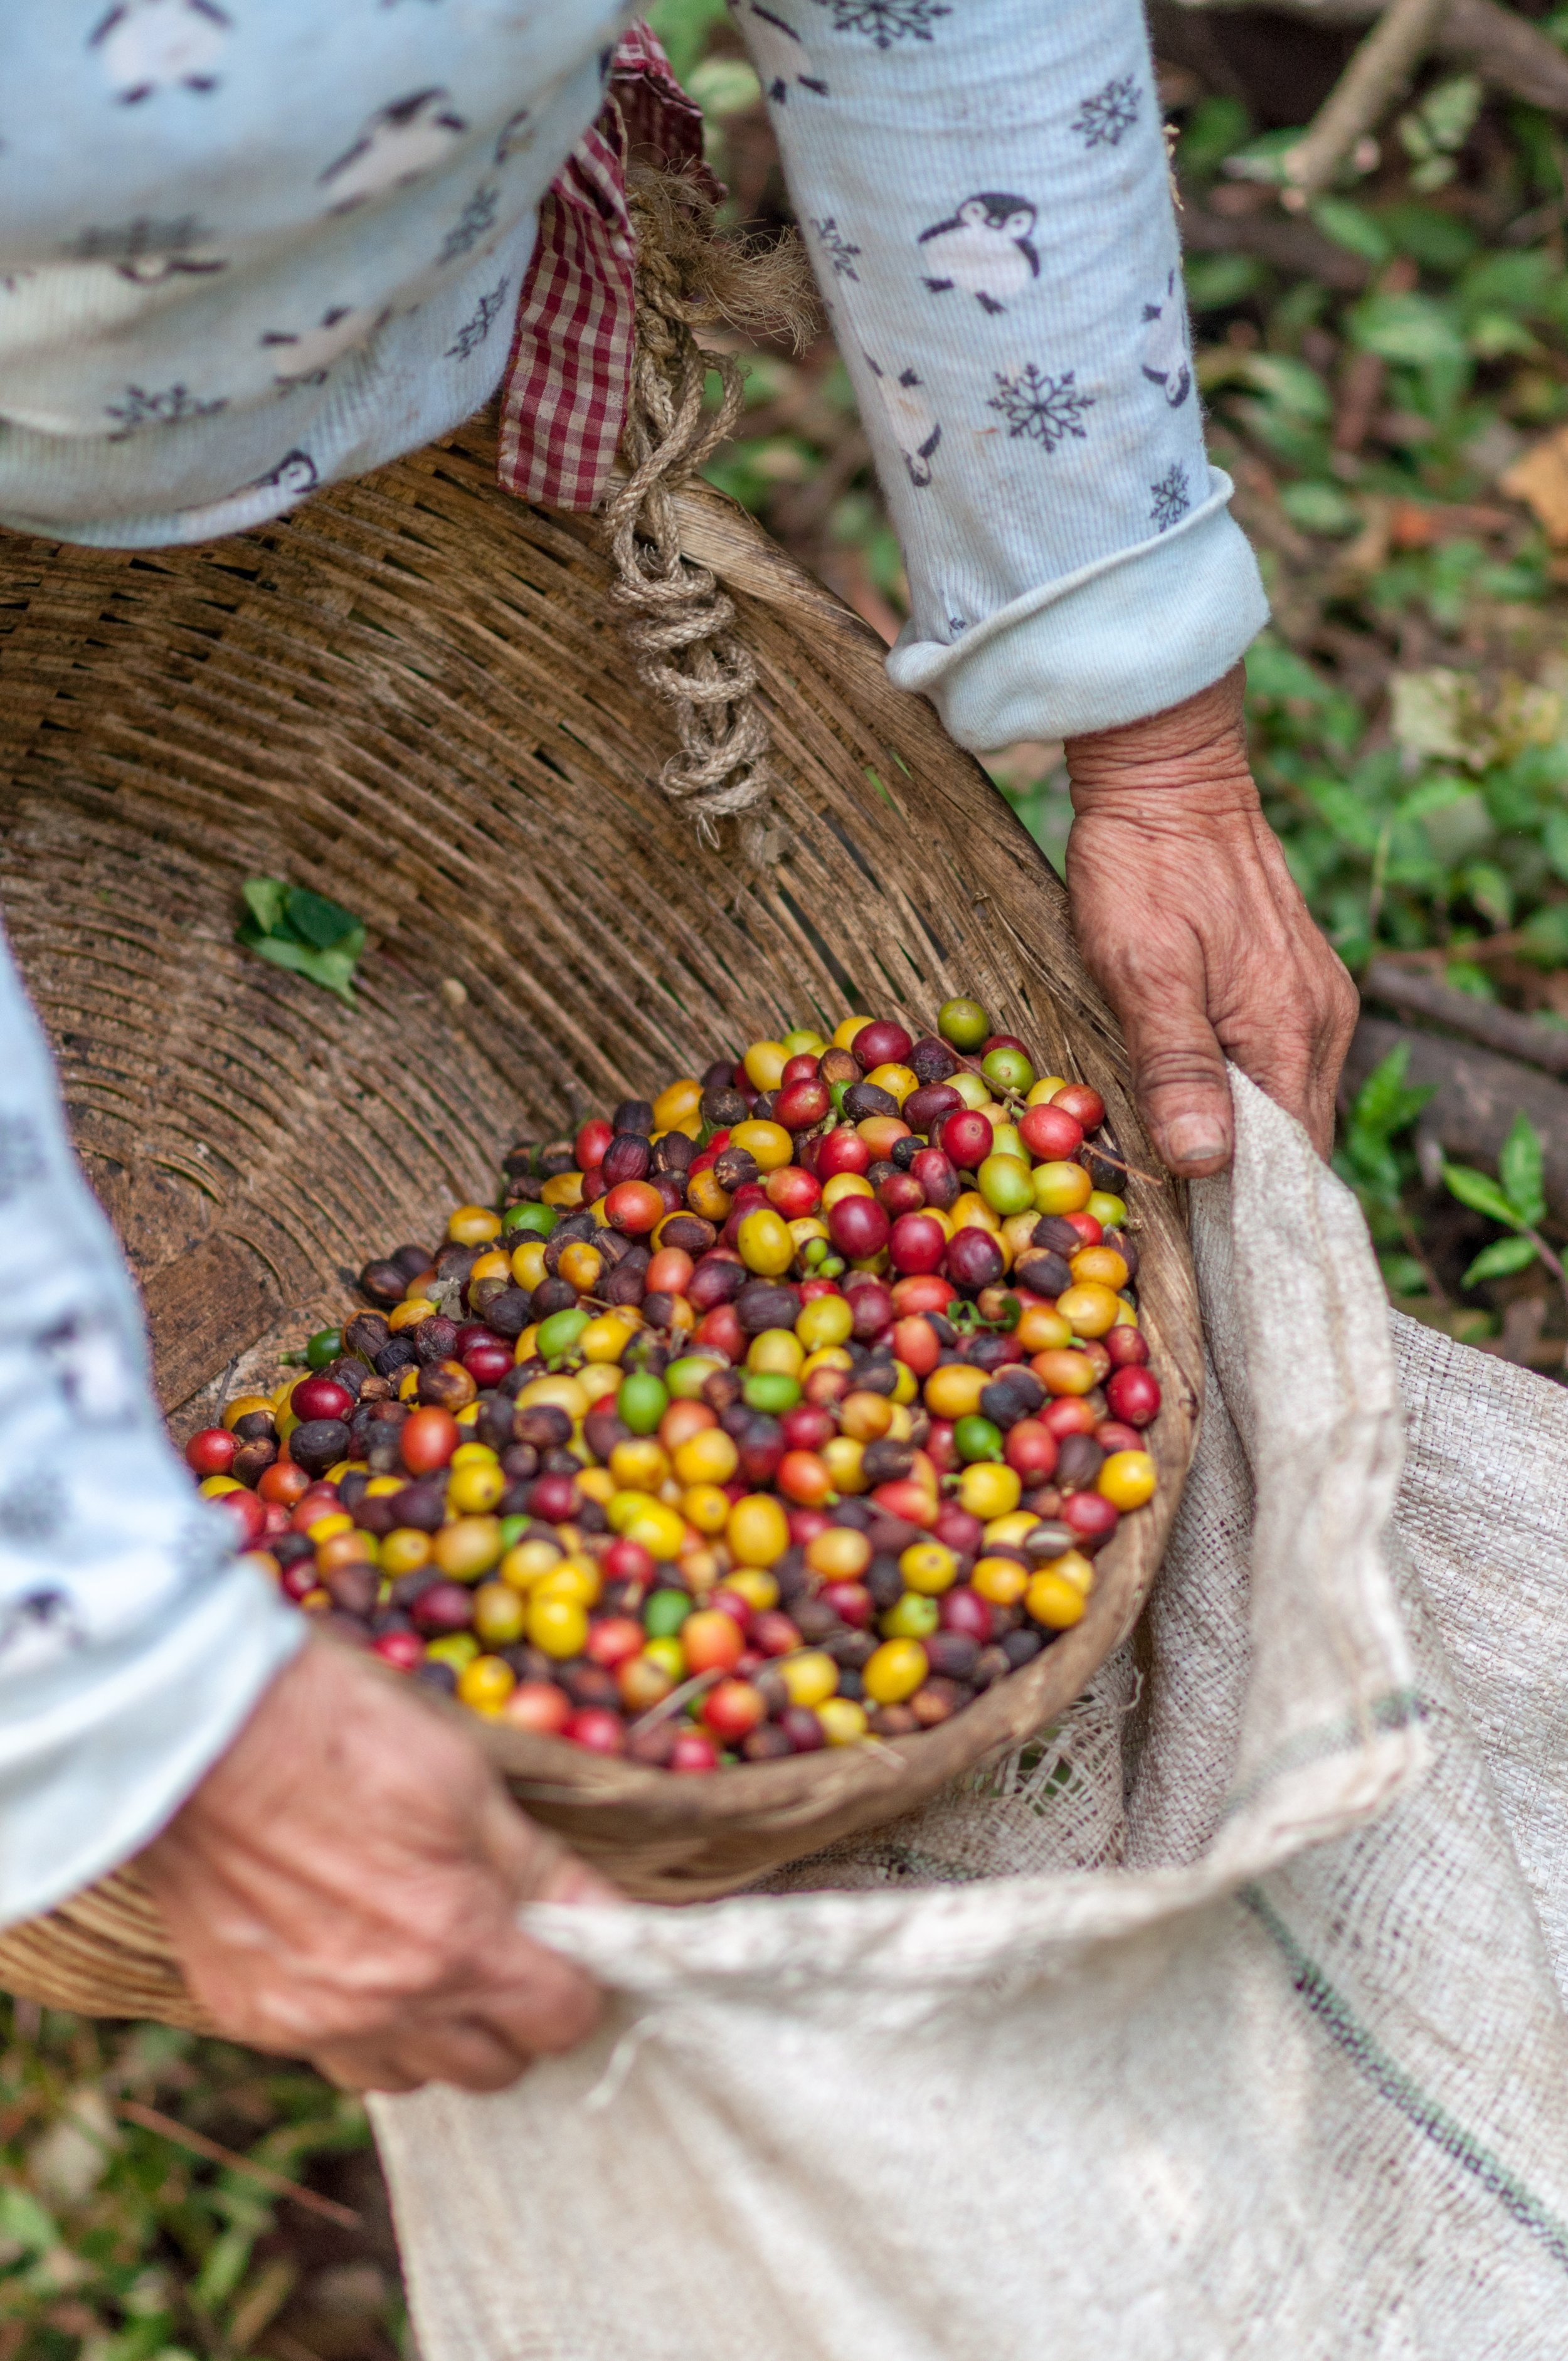 rodrigo-flores-259488-unsplash ethics coffee.jpg